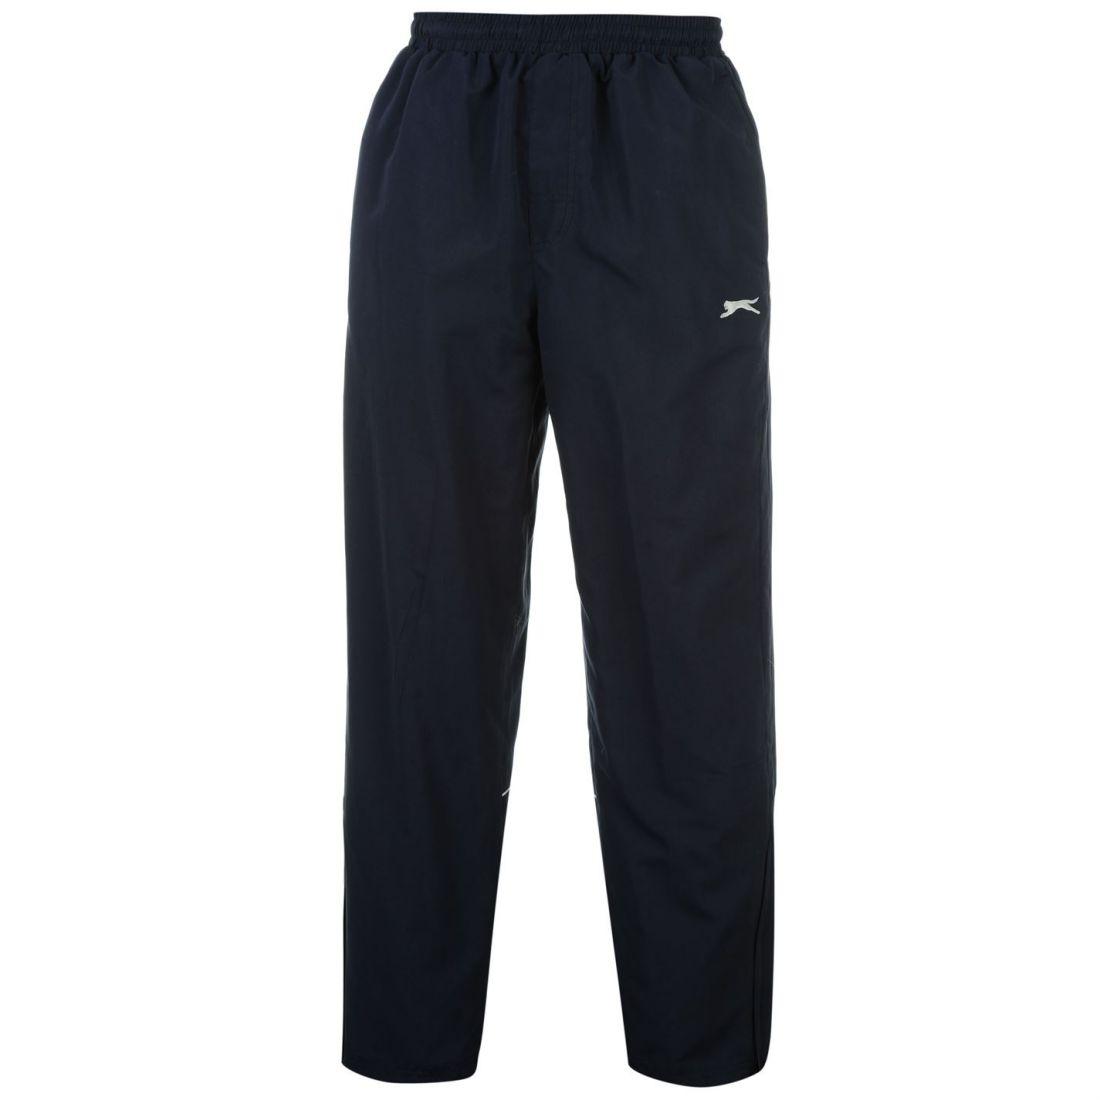 1f51136b804a Slazenger Mens Open Hem Woven Sweatpants Jogging Bottoms Joggers Sport Pants